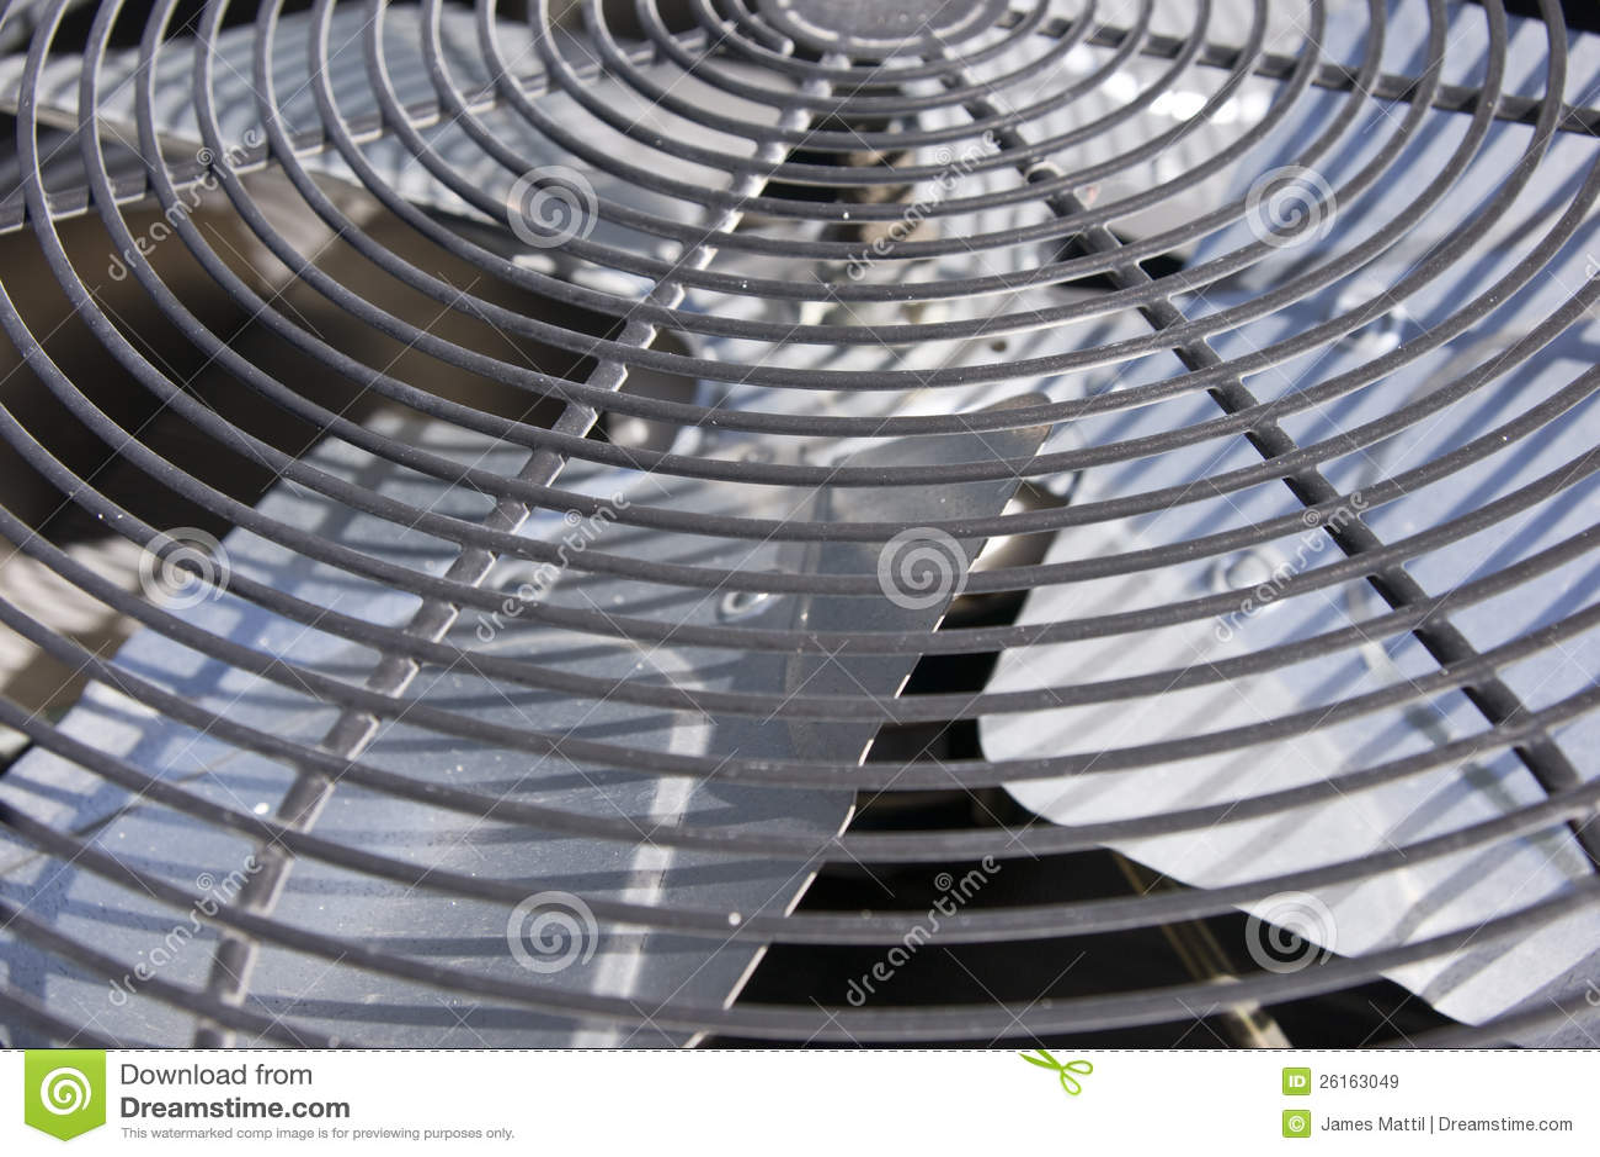 Hvac Cooling Fan : Hvac cooling fan royalty free stock images image